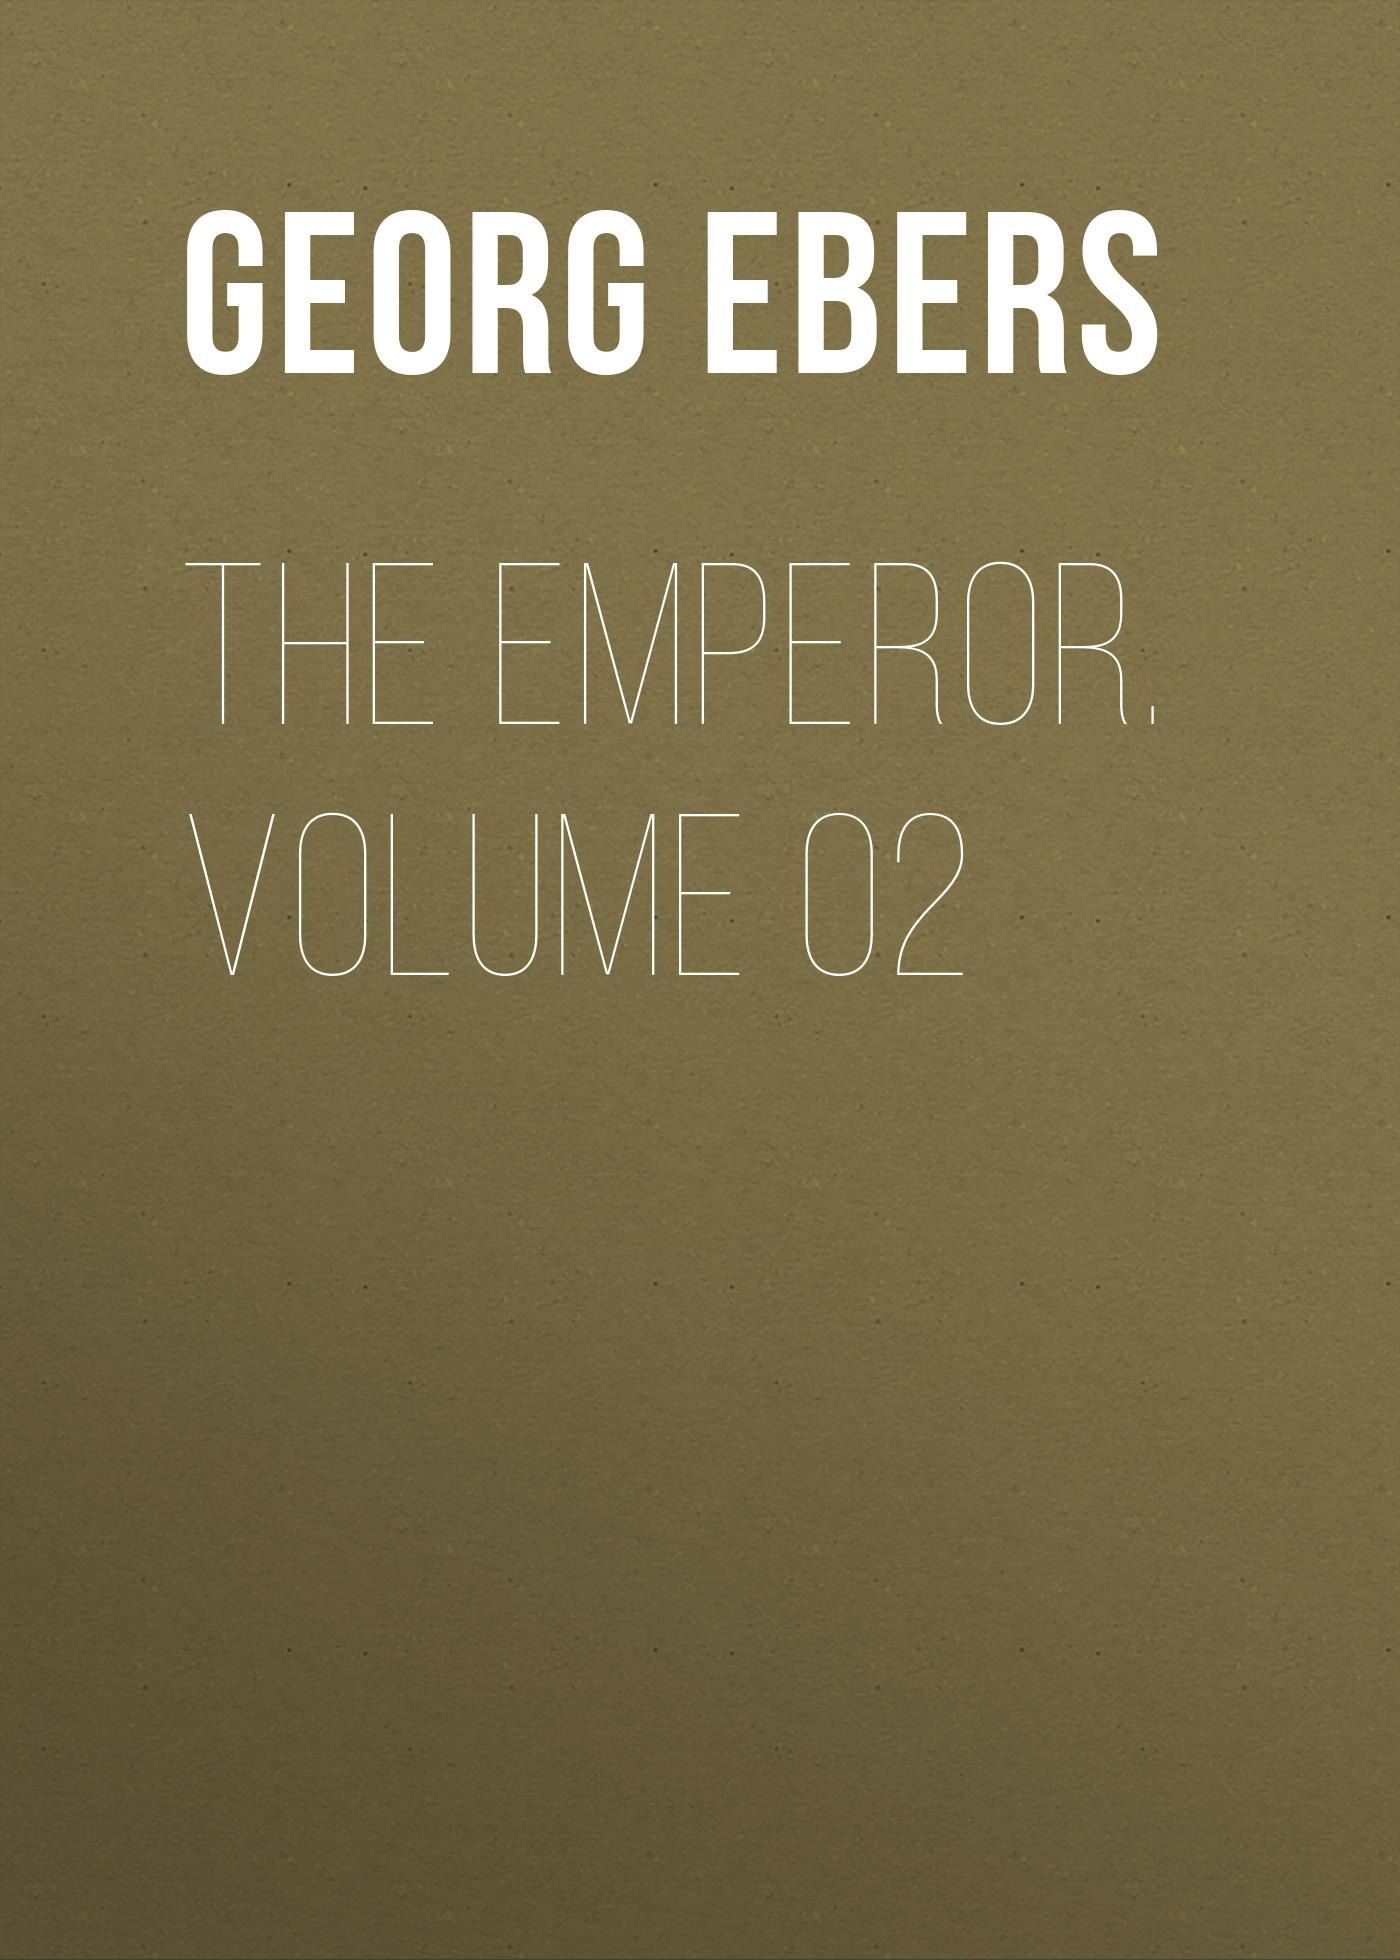 Georg Ebers The Emperor. Volume 02 georg ebers homo sum volume 02